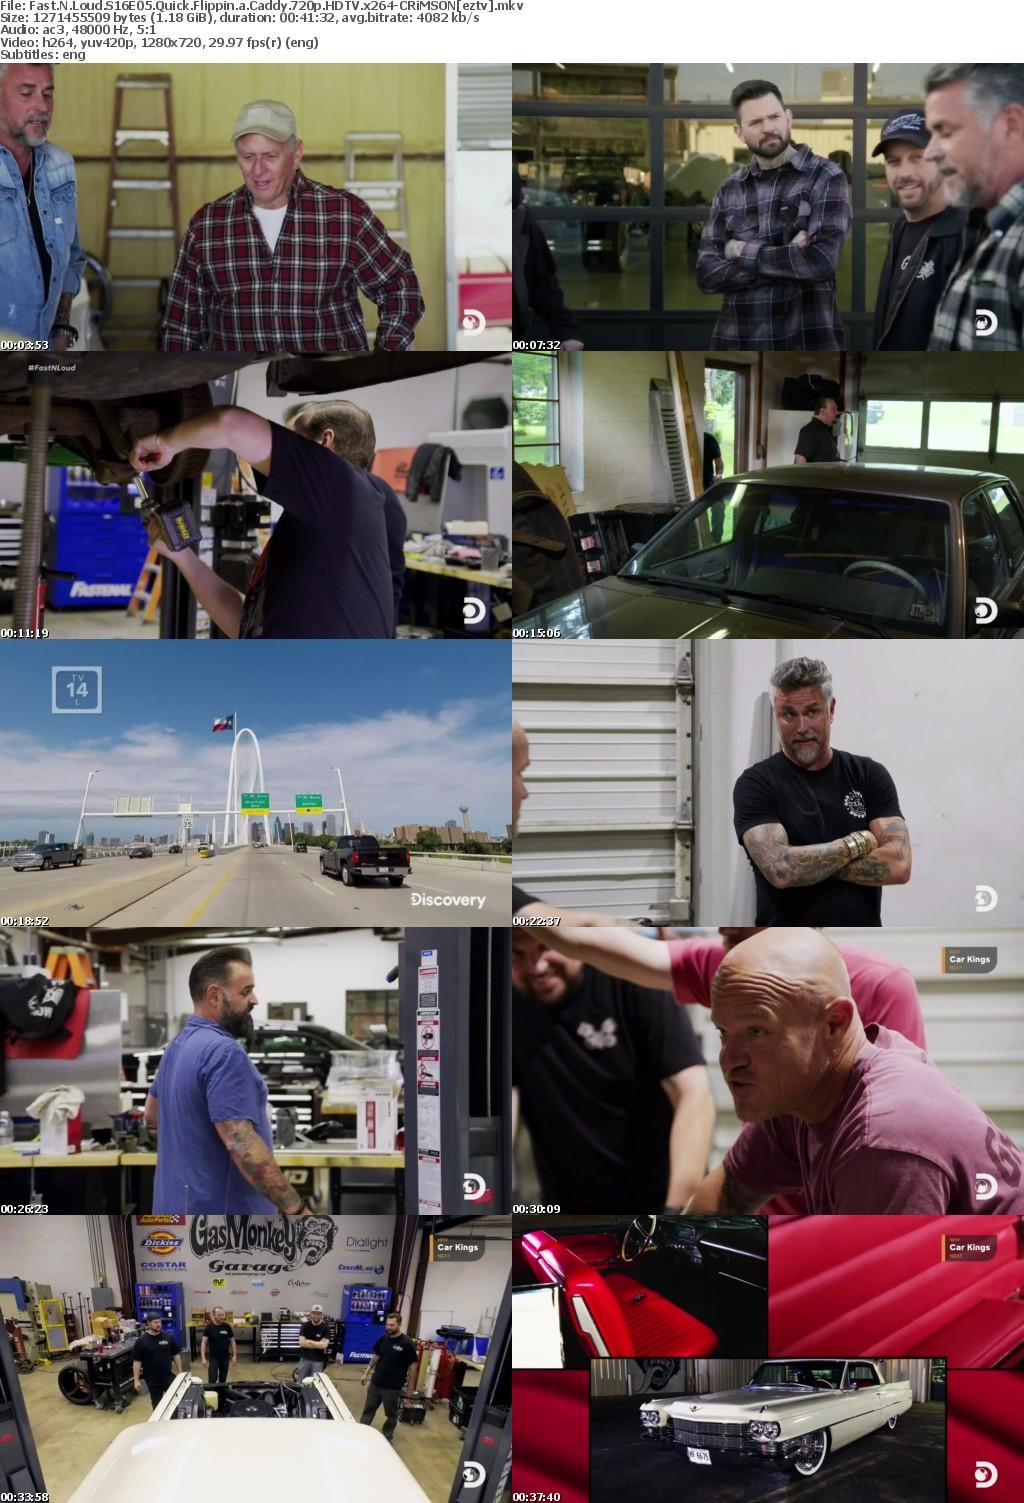 Fast N Loud S16E05 Quick Flippin a Caddy 720p HDTV x264-CRiMSON